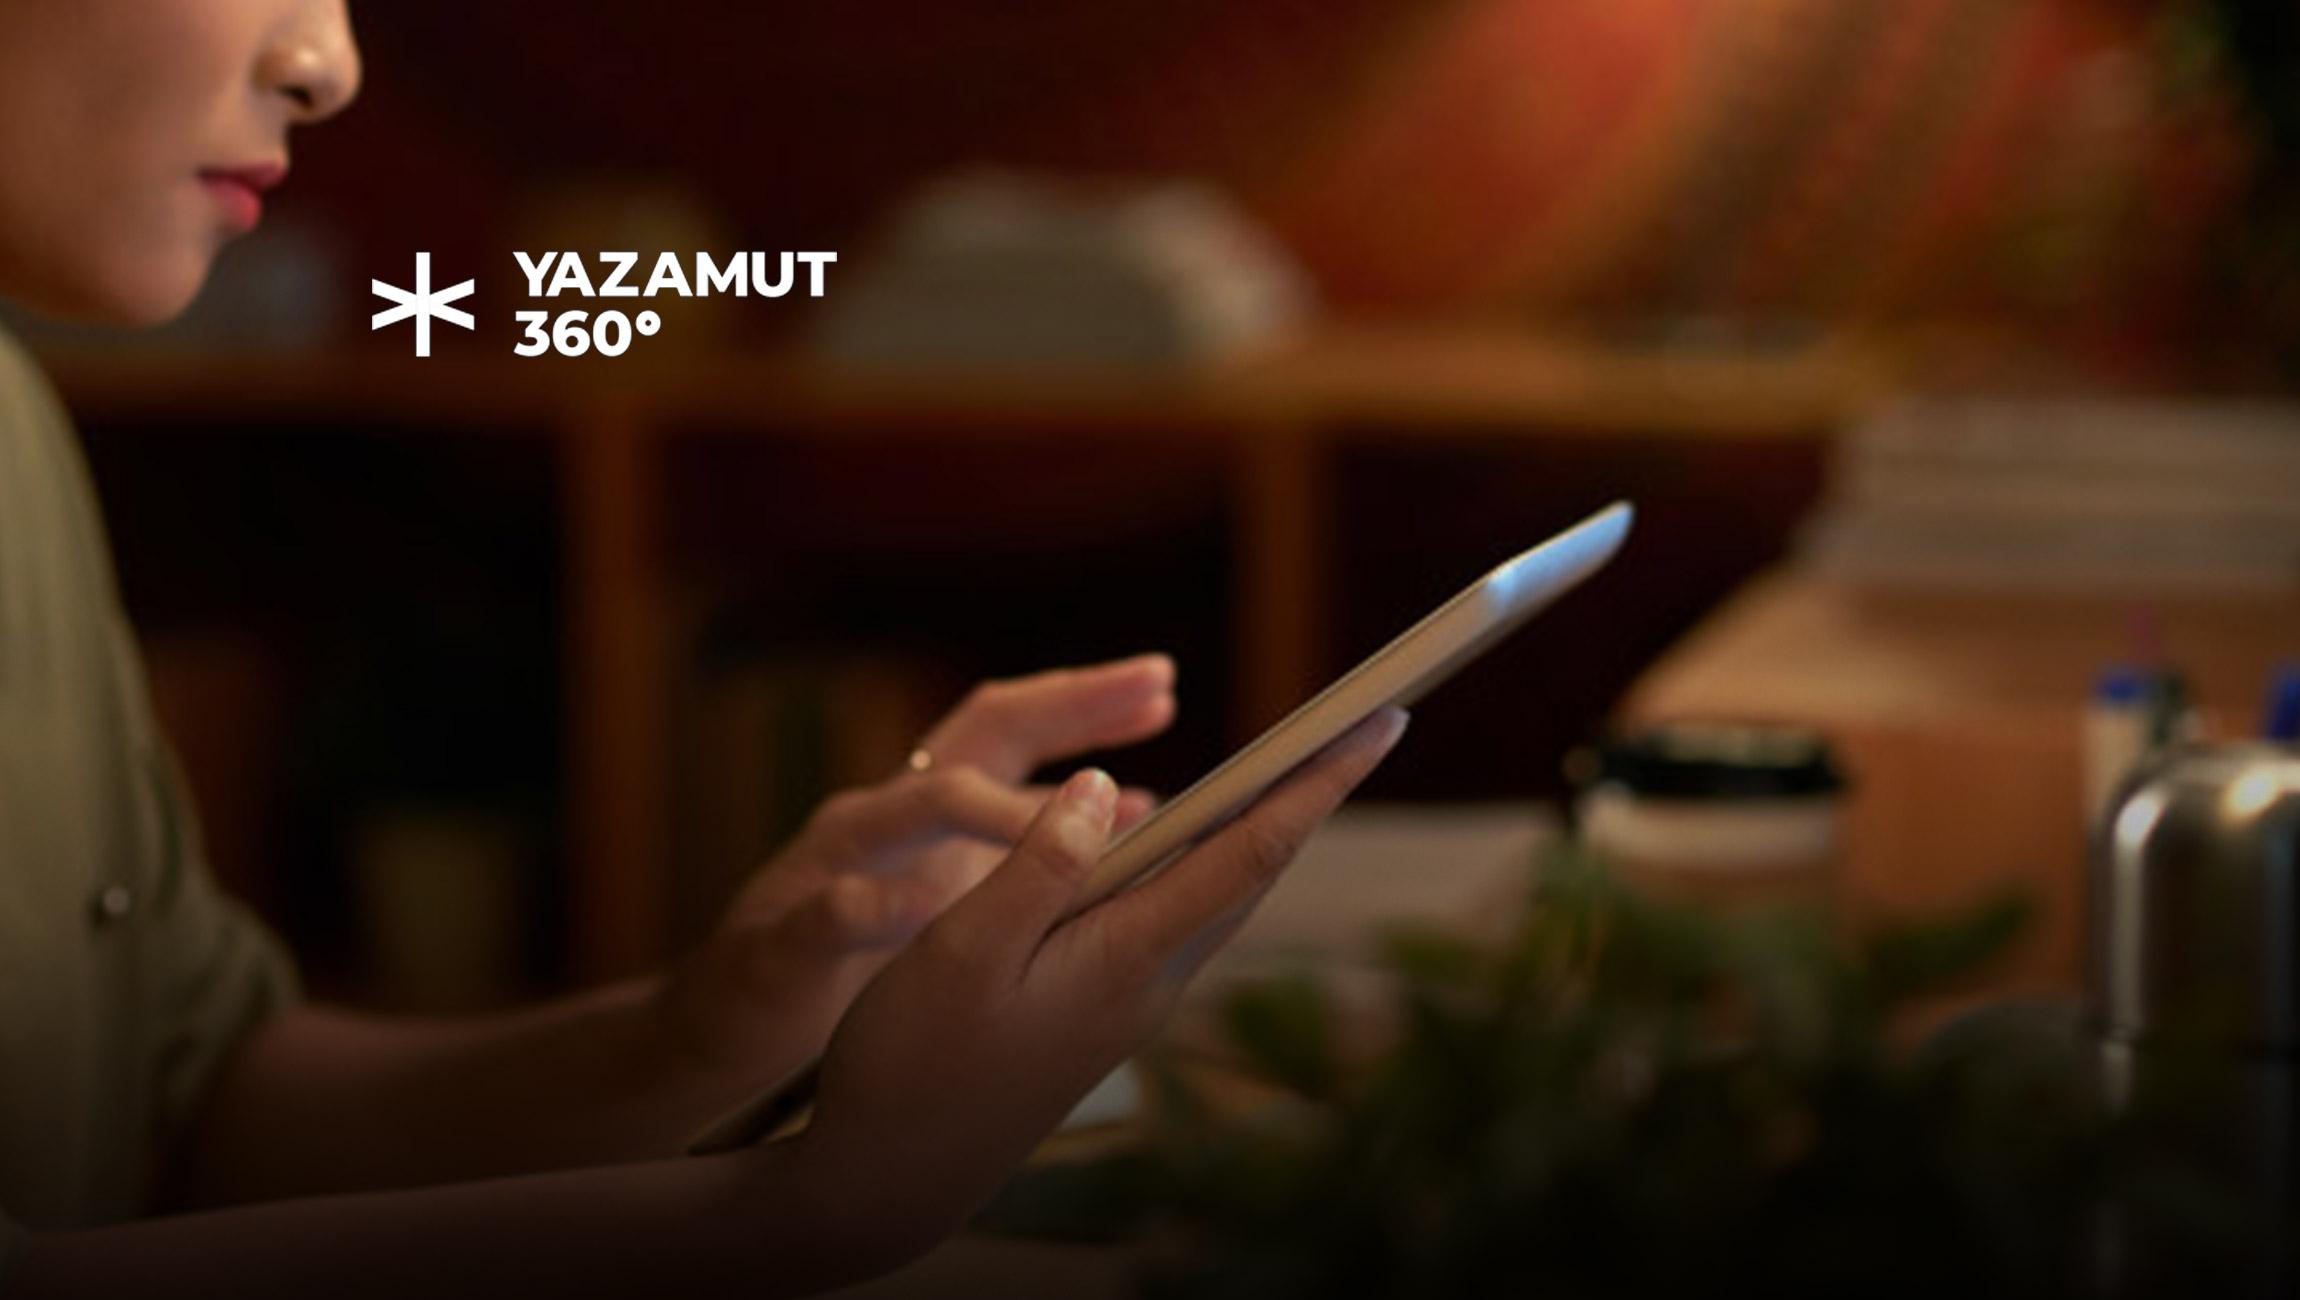 Yazamut360 Entrepreneurship Center of Ben-Gurion University Launches Oazis Accelerator to Promote New Technologies Originating from the University